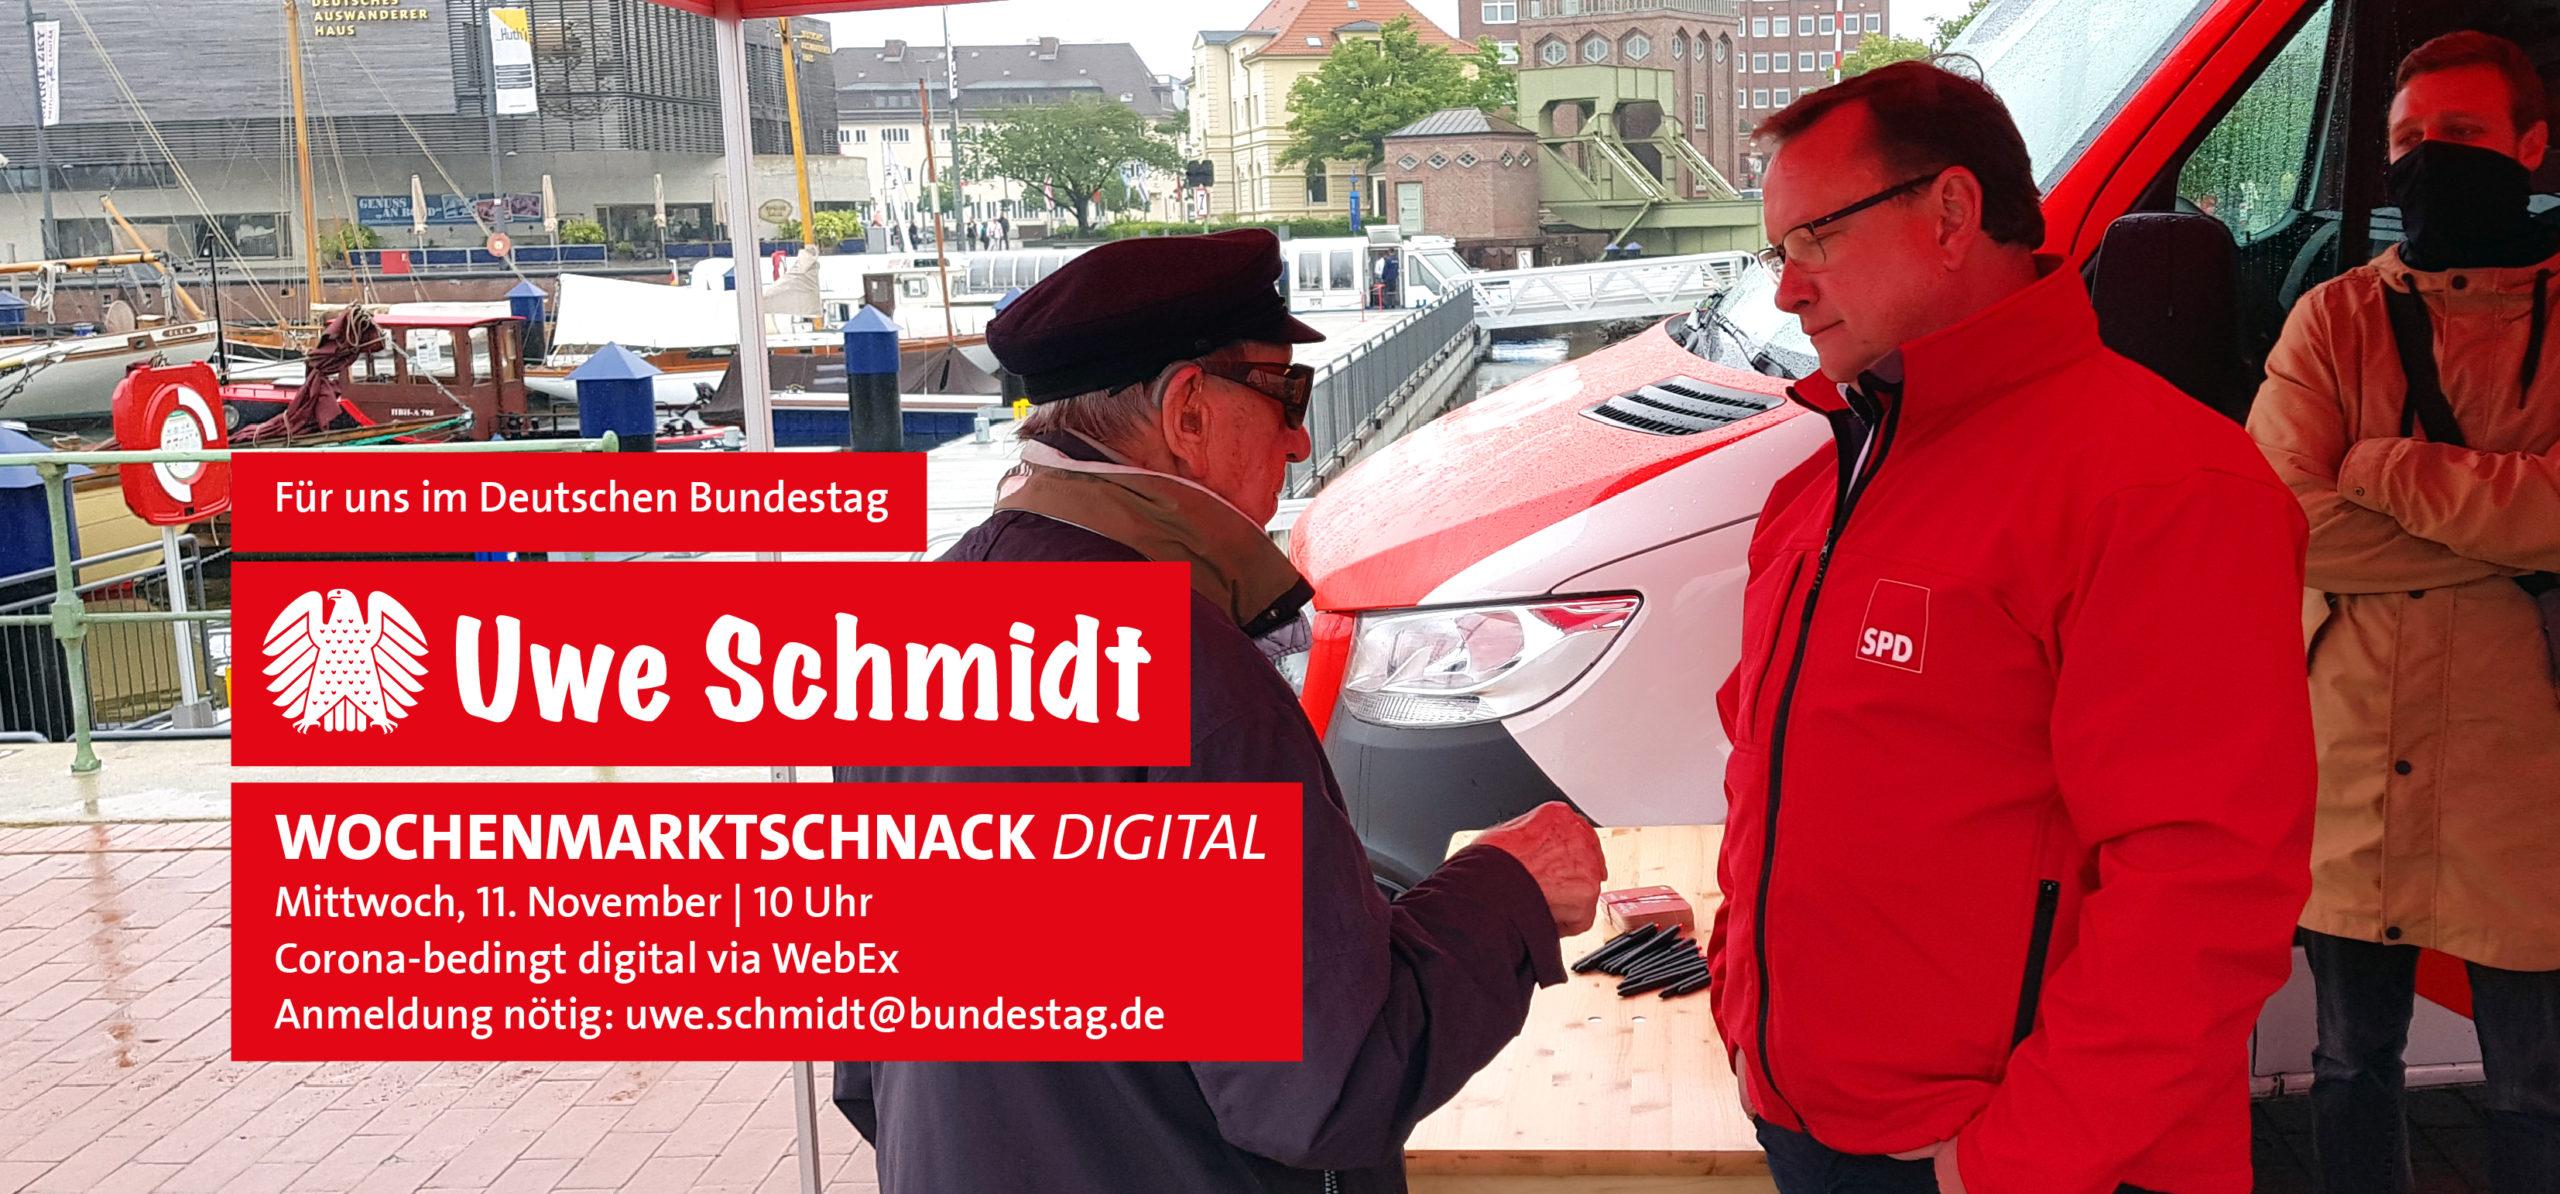 20201101_Schmidt_Schnack_Banner_V1